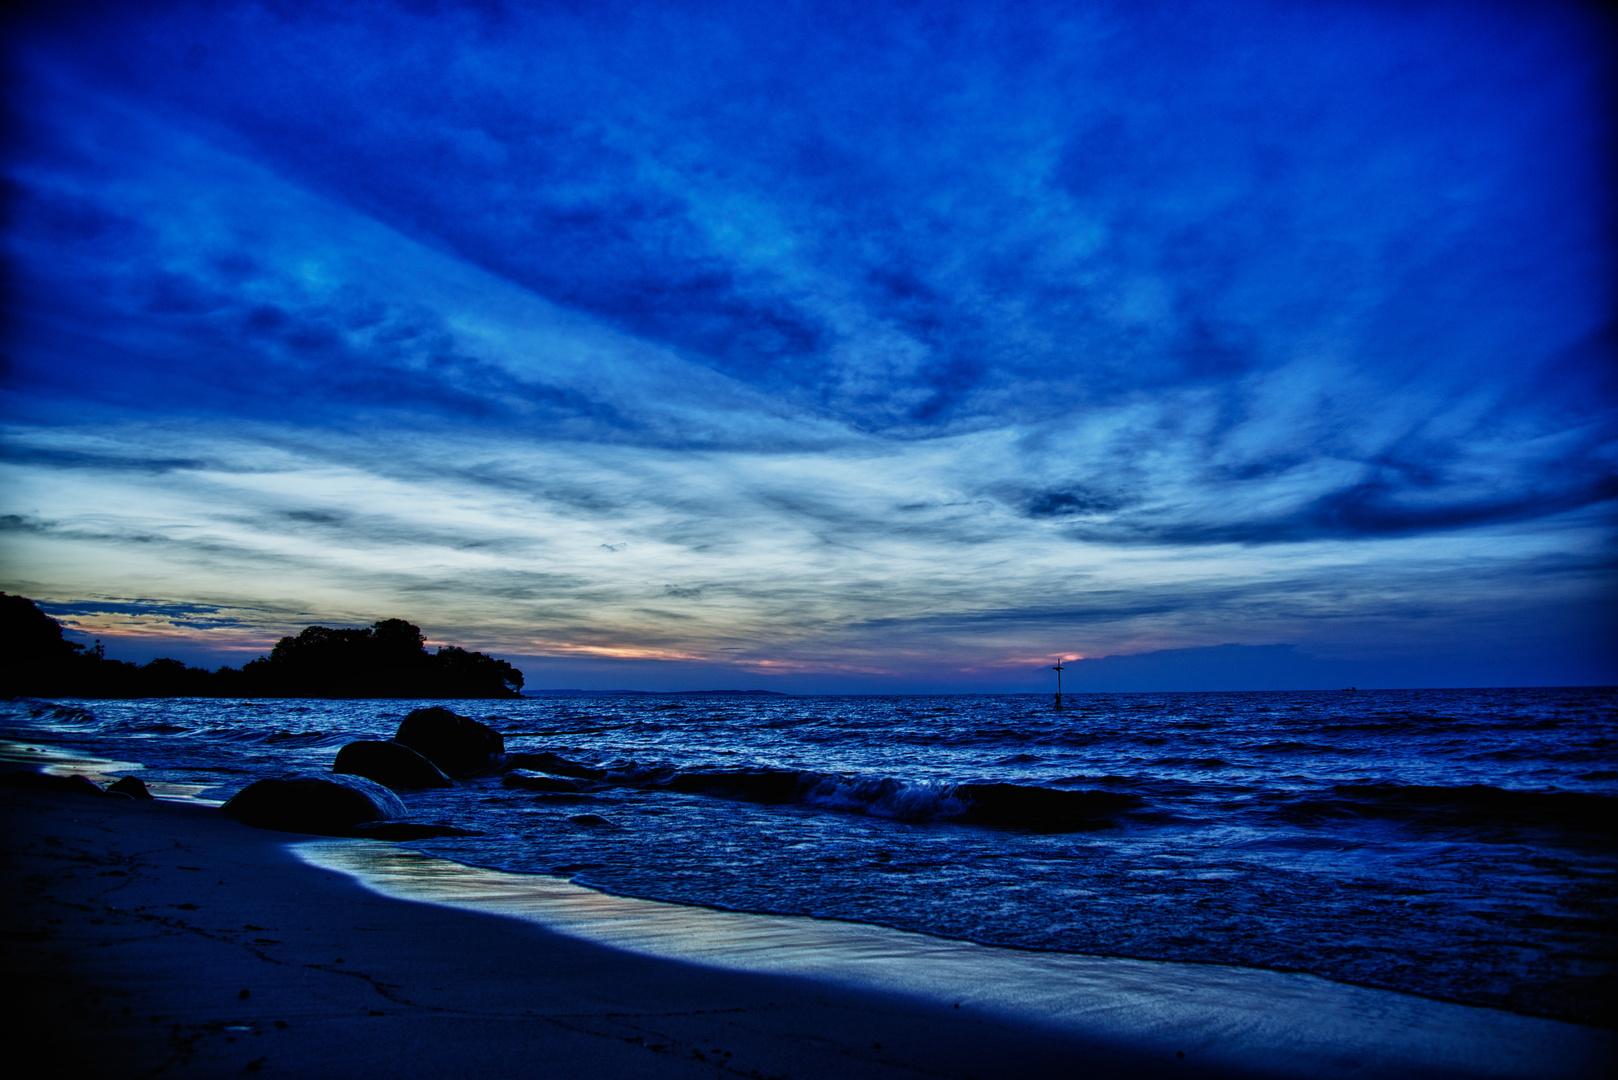 Sunset @ Lake Victoria